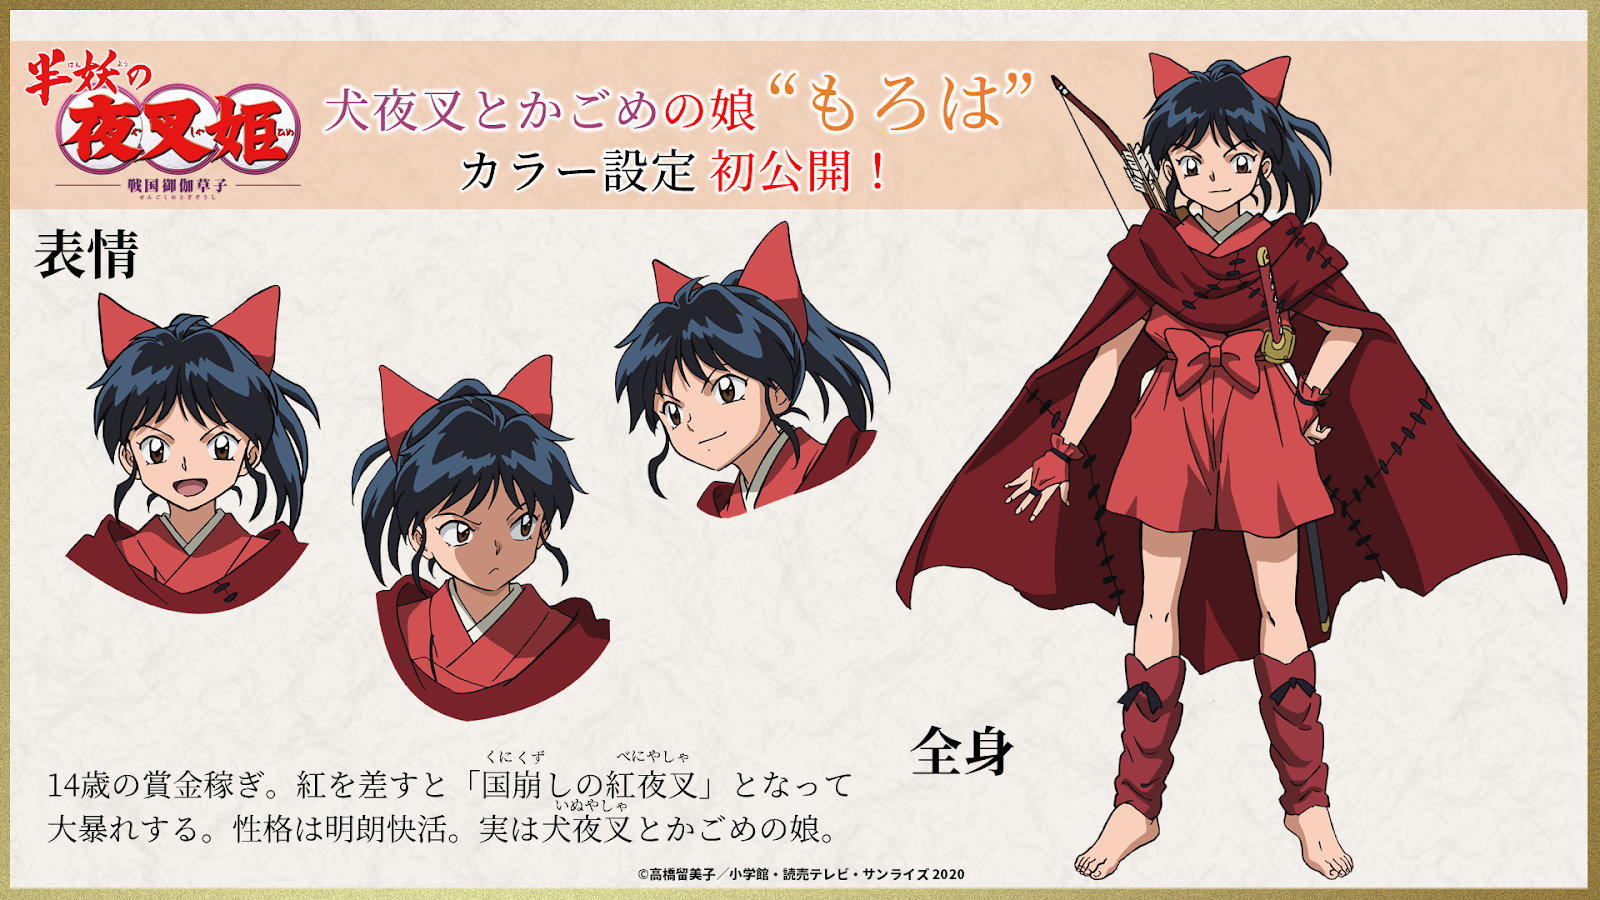 Anime Yashahime Mengungkap Desain Karakter Putri Inuyasha Versi Berwarna Extalia Hobbies